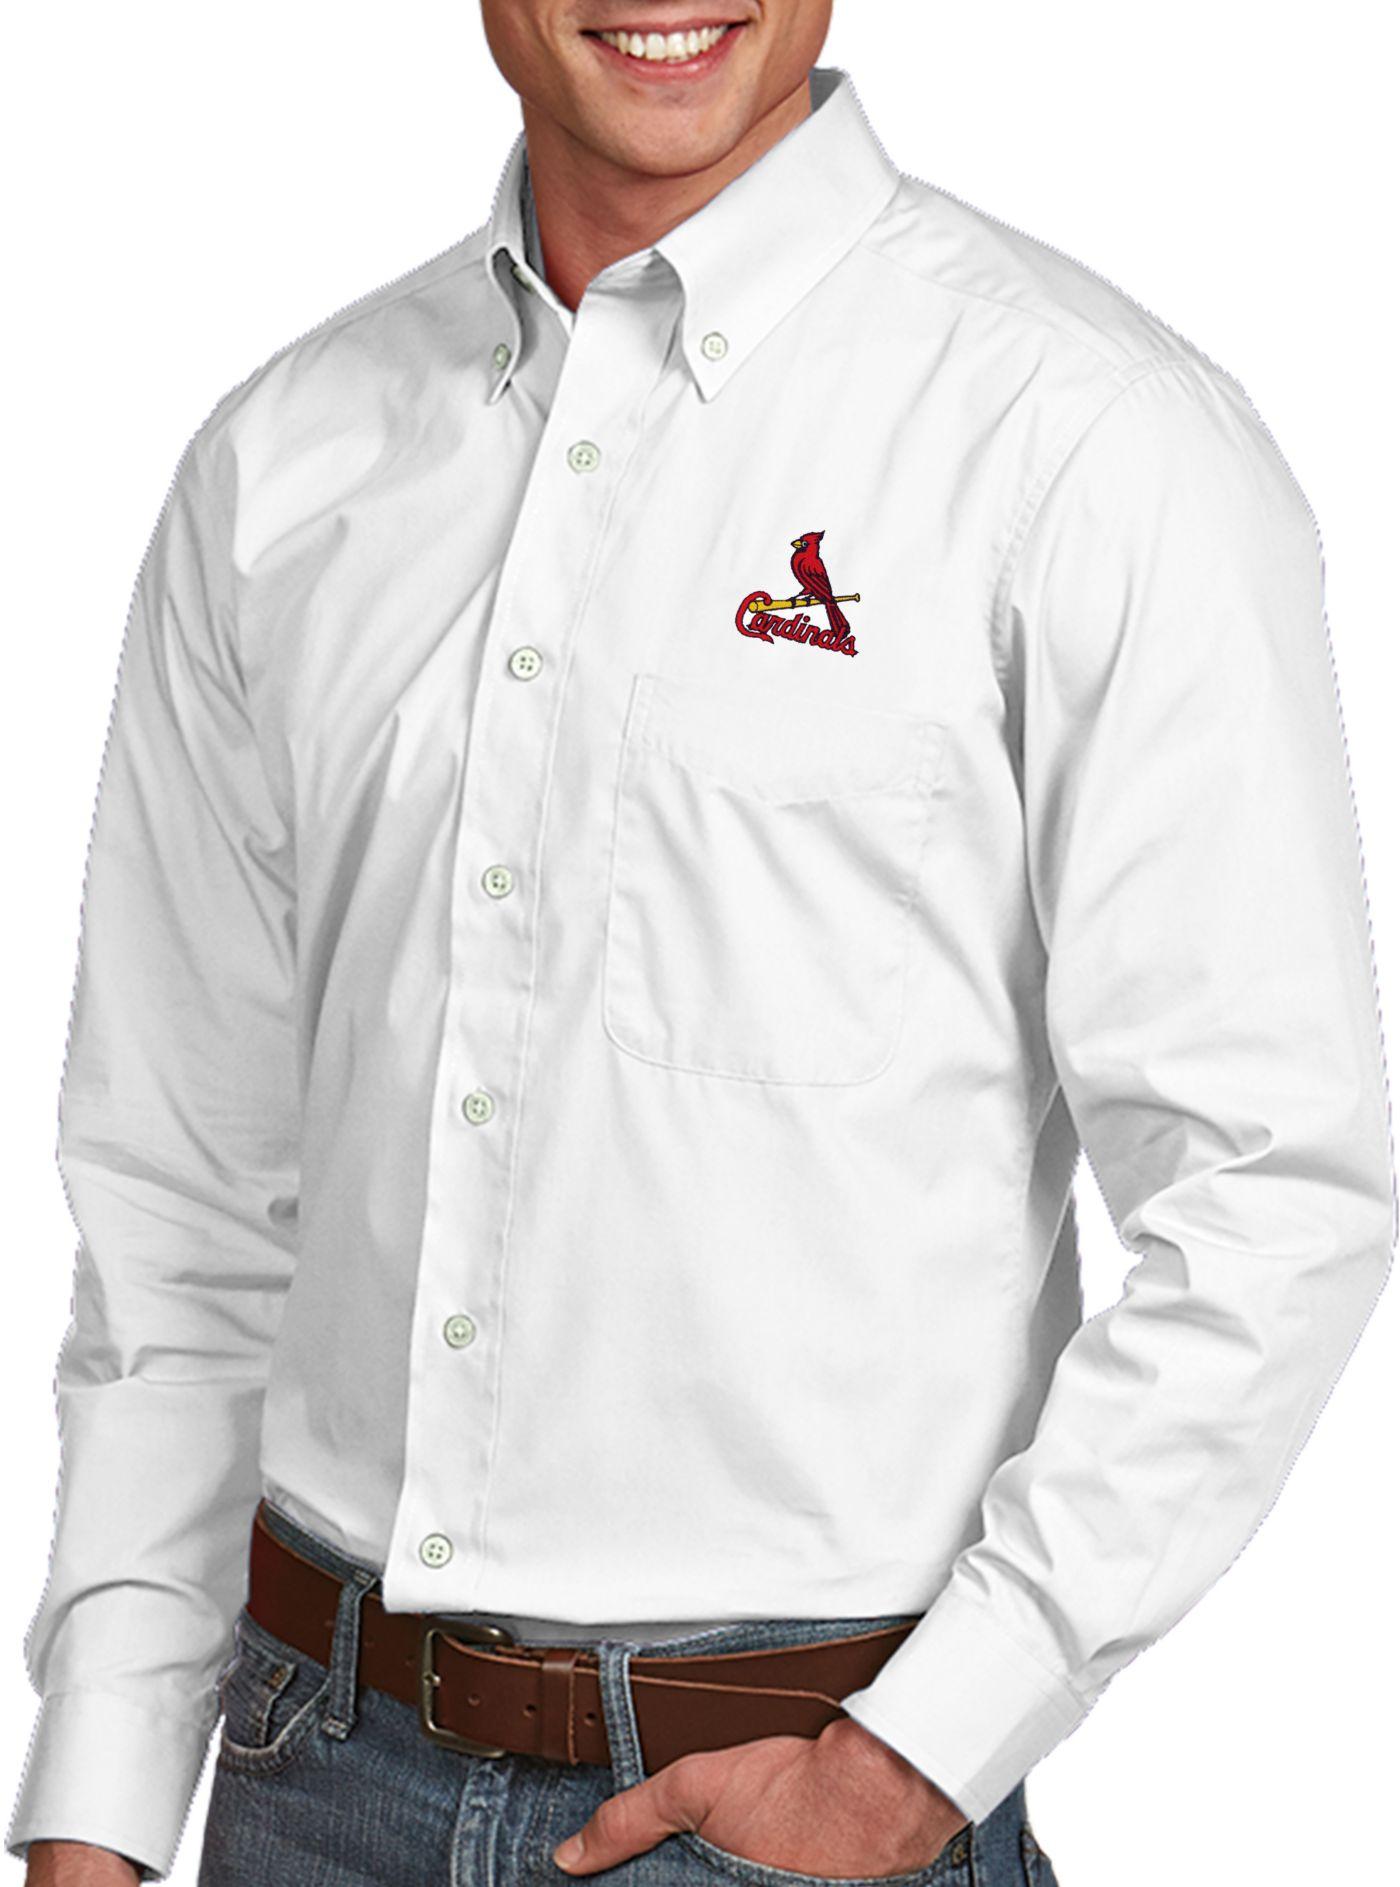 Antigua Men's St. Louis Cardinals Dynasty Button-Up White Long Sleeve Shirt